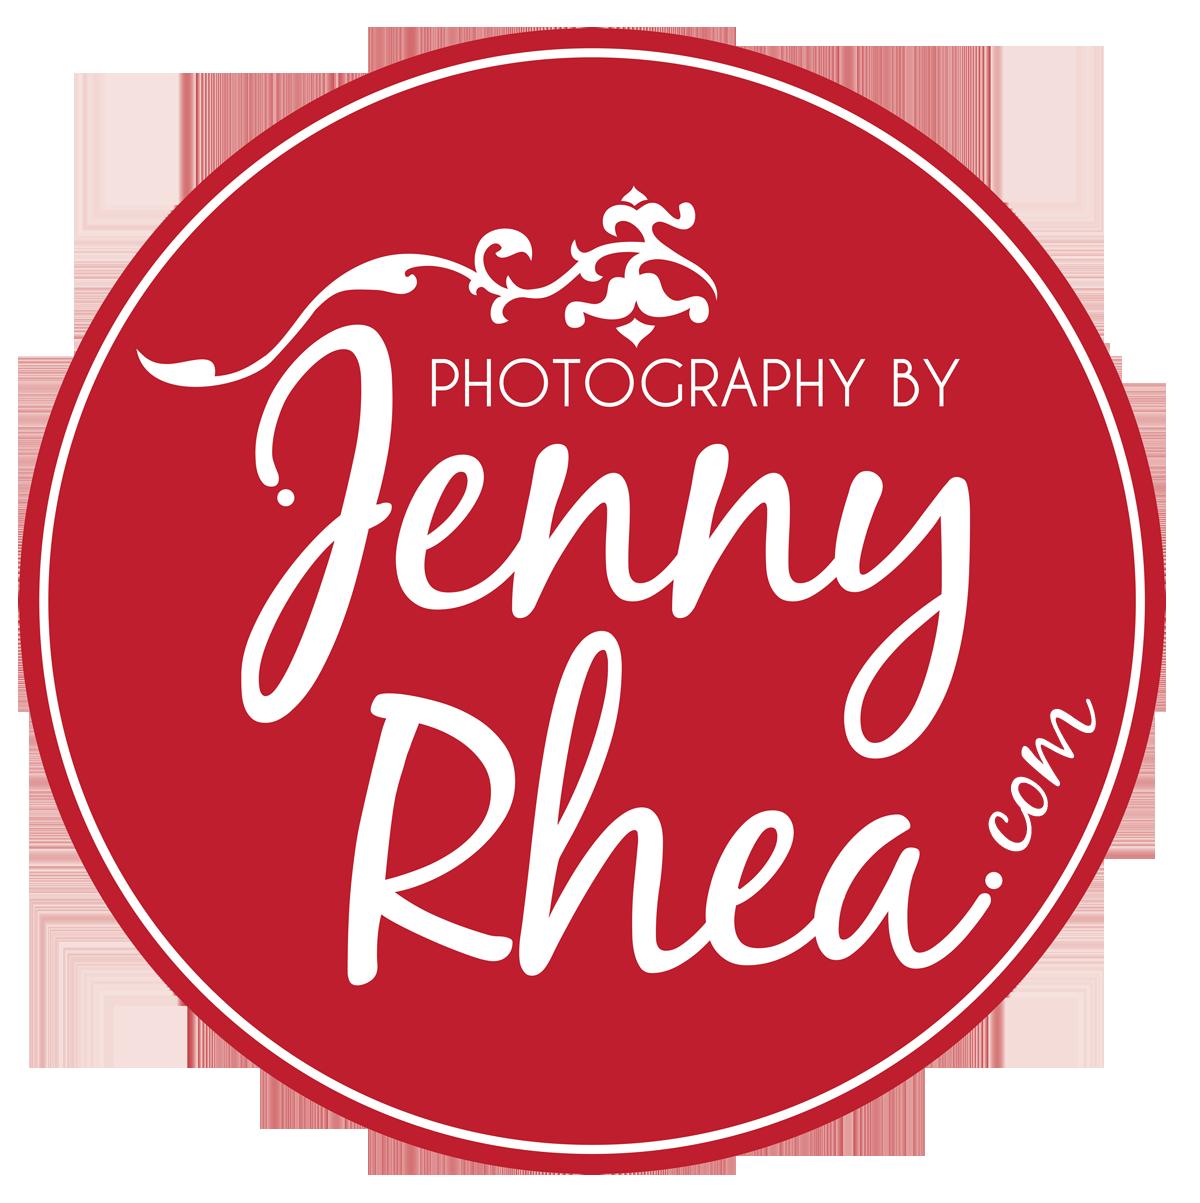 Photography by Jenny Rhea